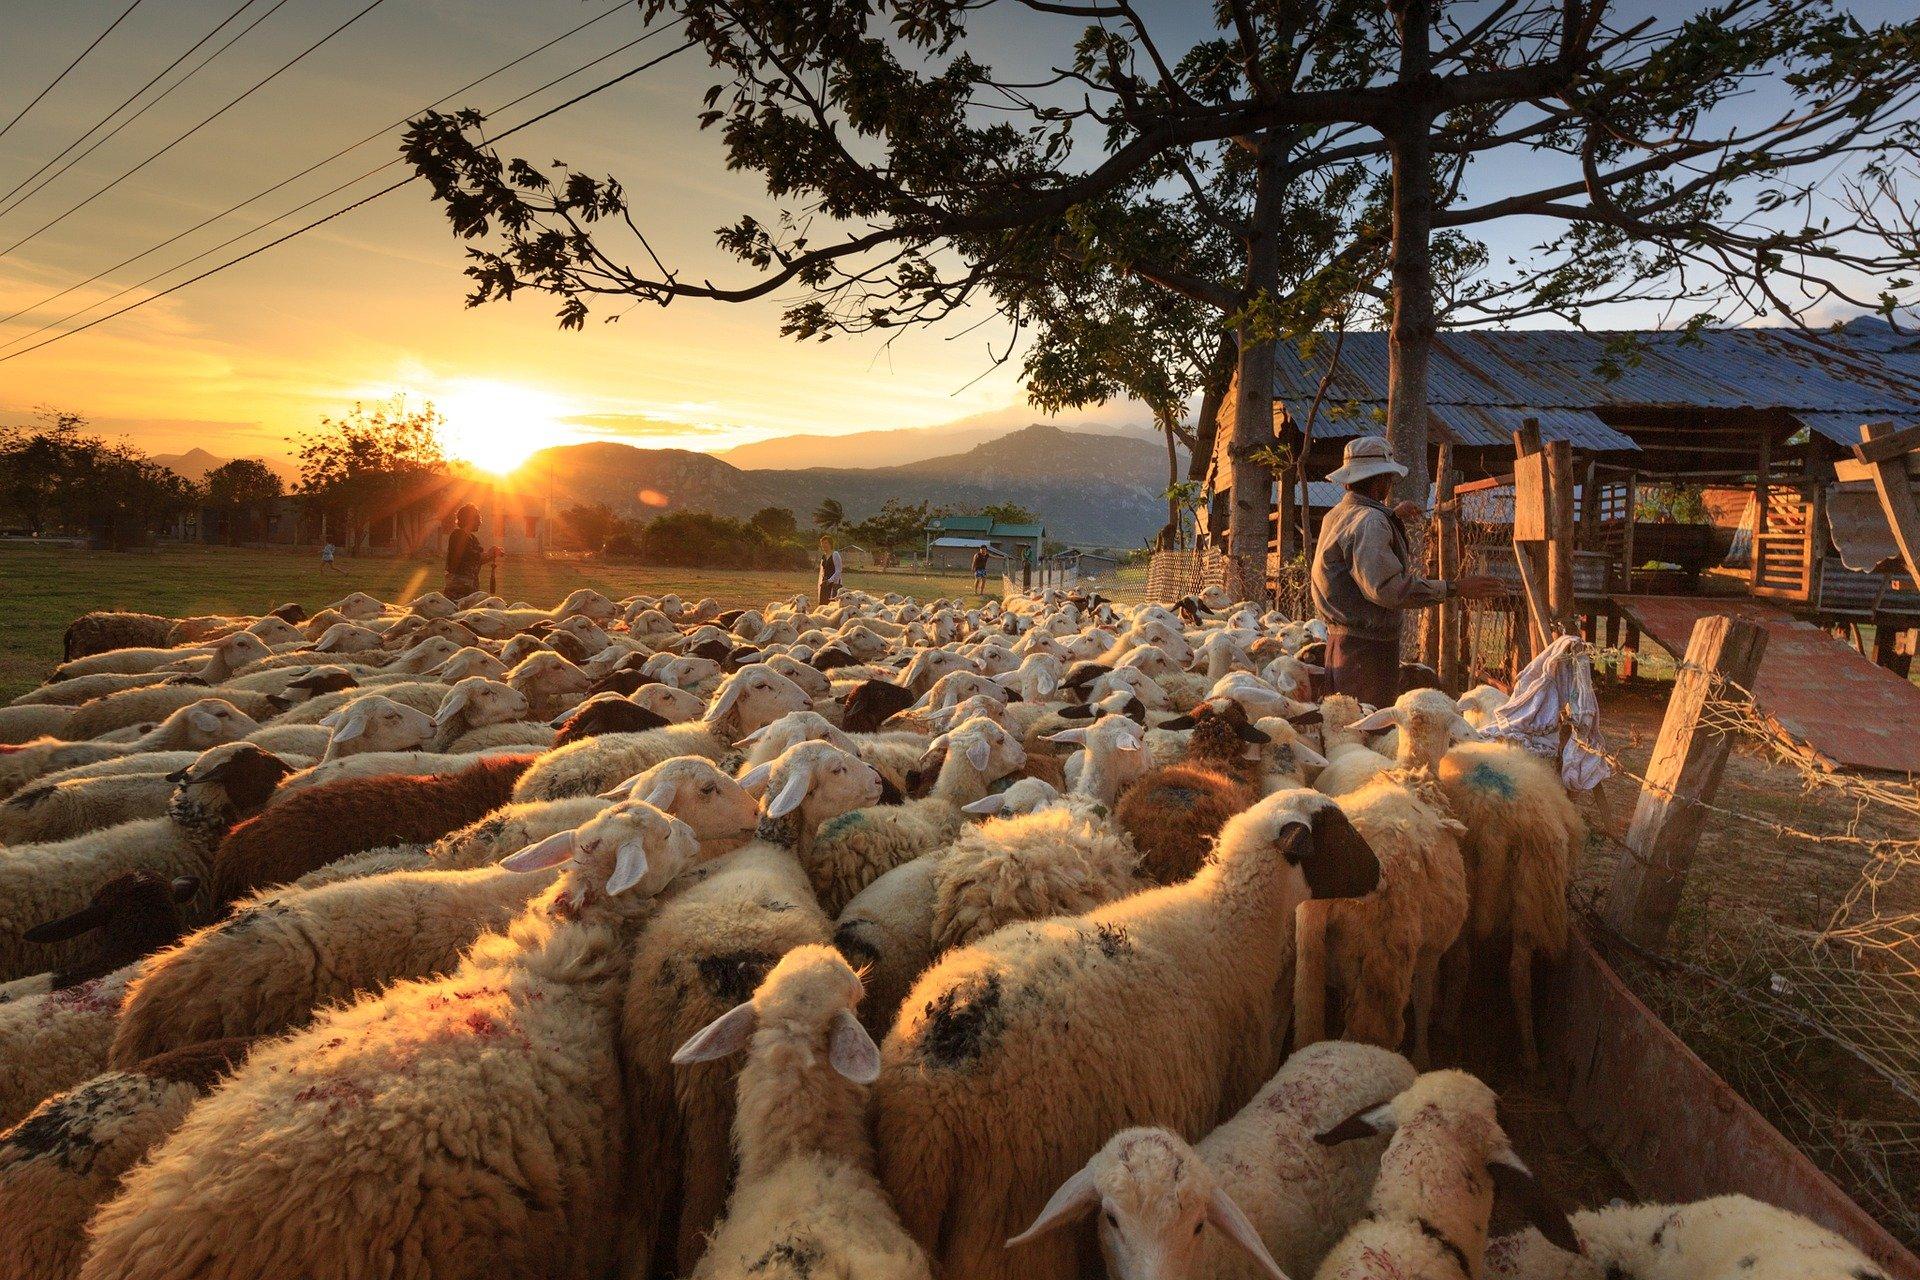 sheep-3023520_1920